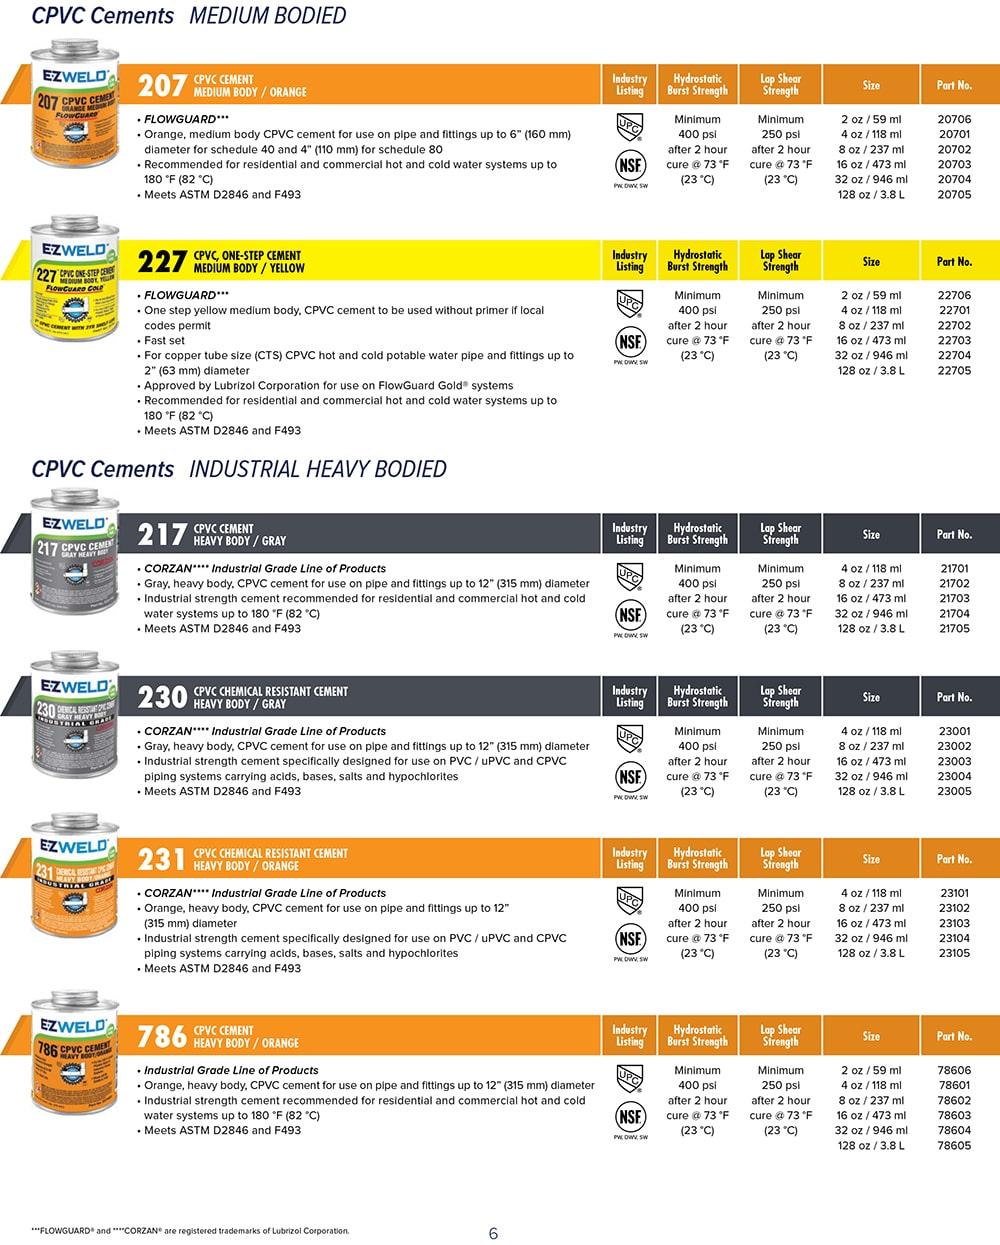 EZ-Weld-Product-Catalog-v9.5-Digital-6